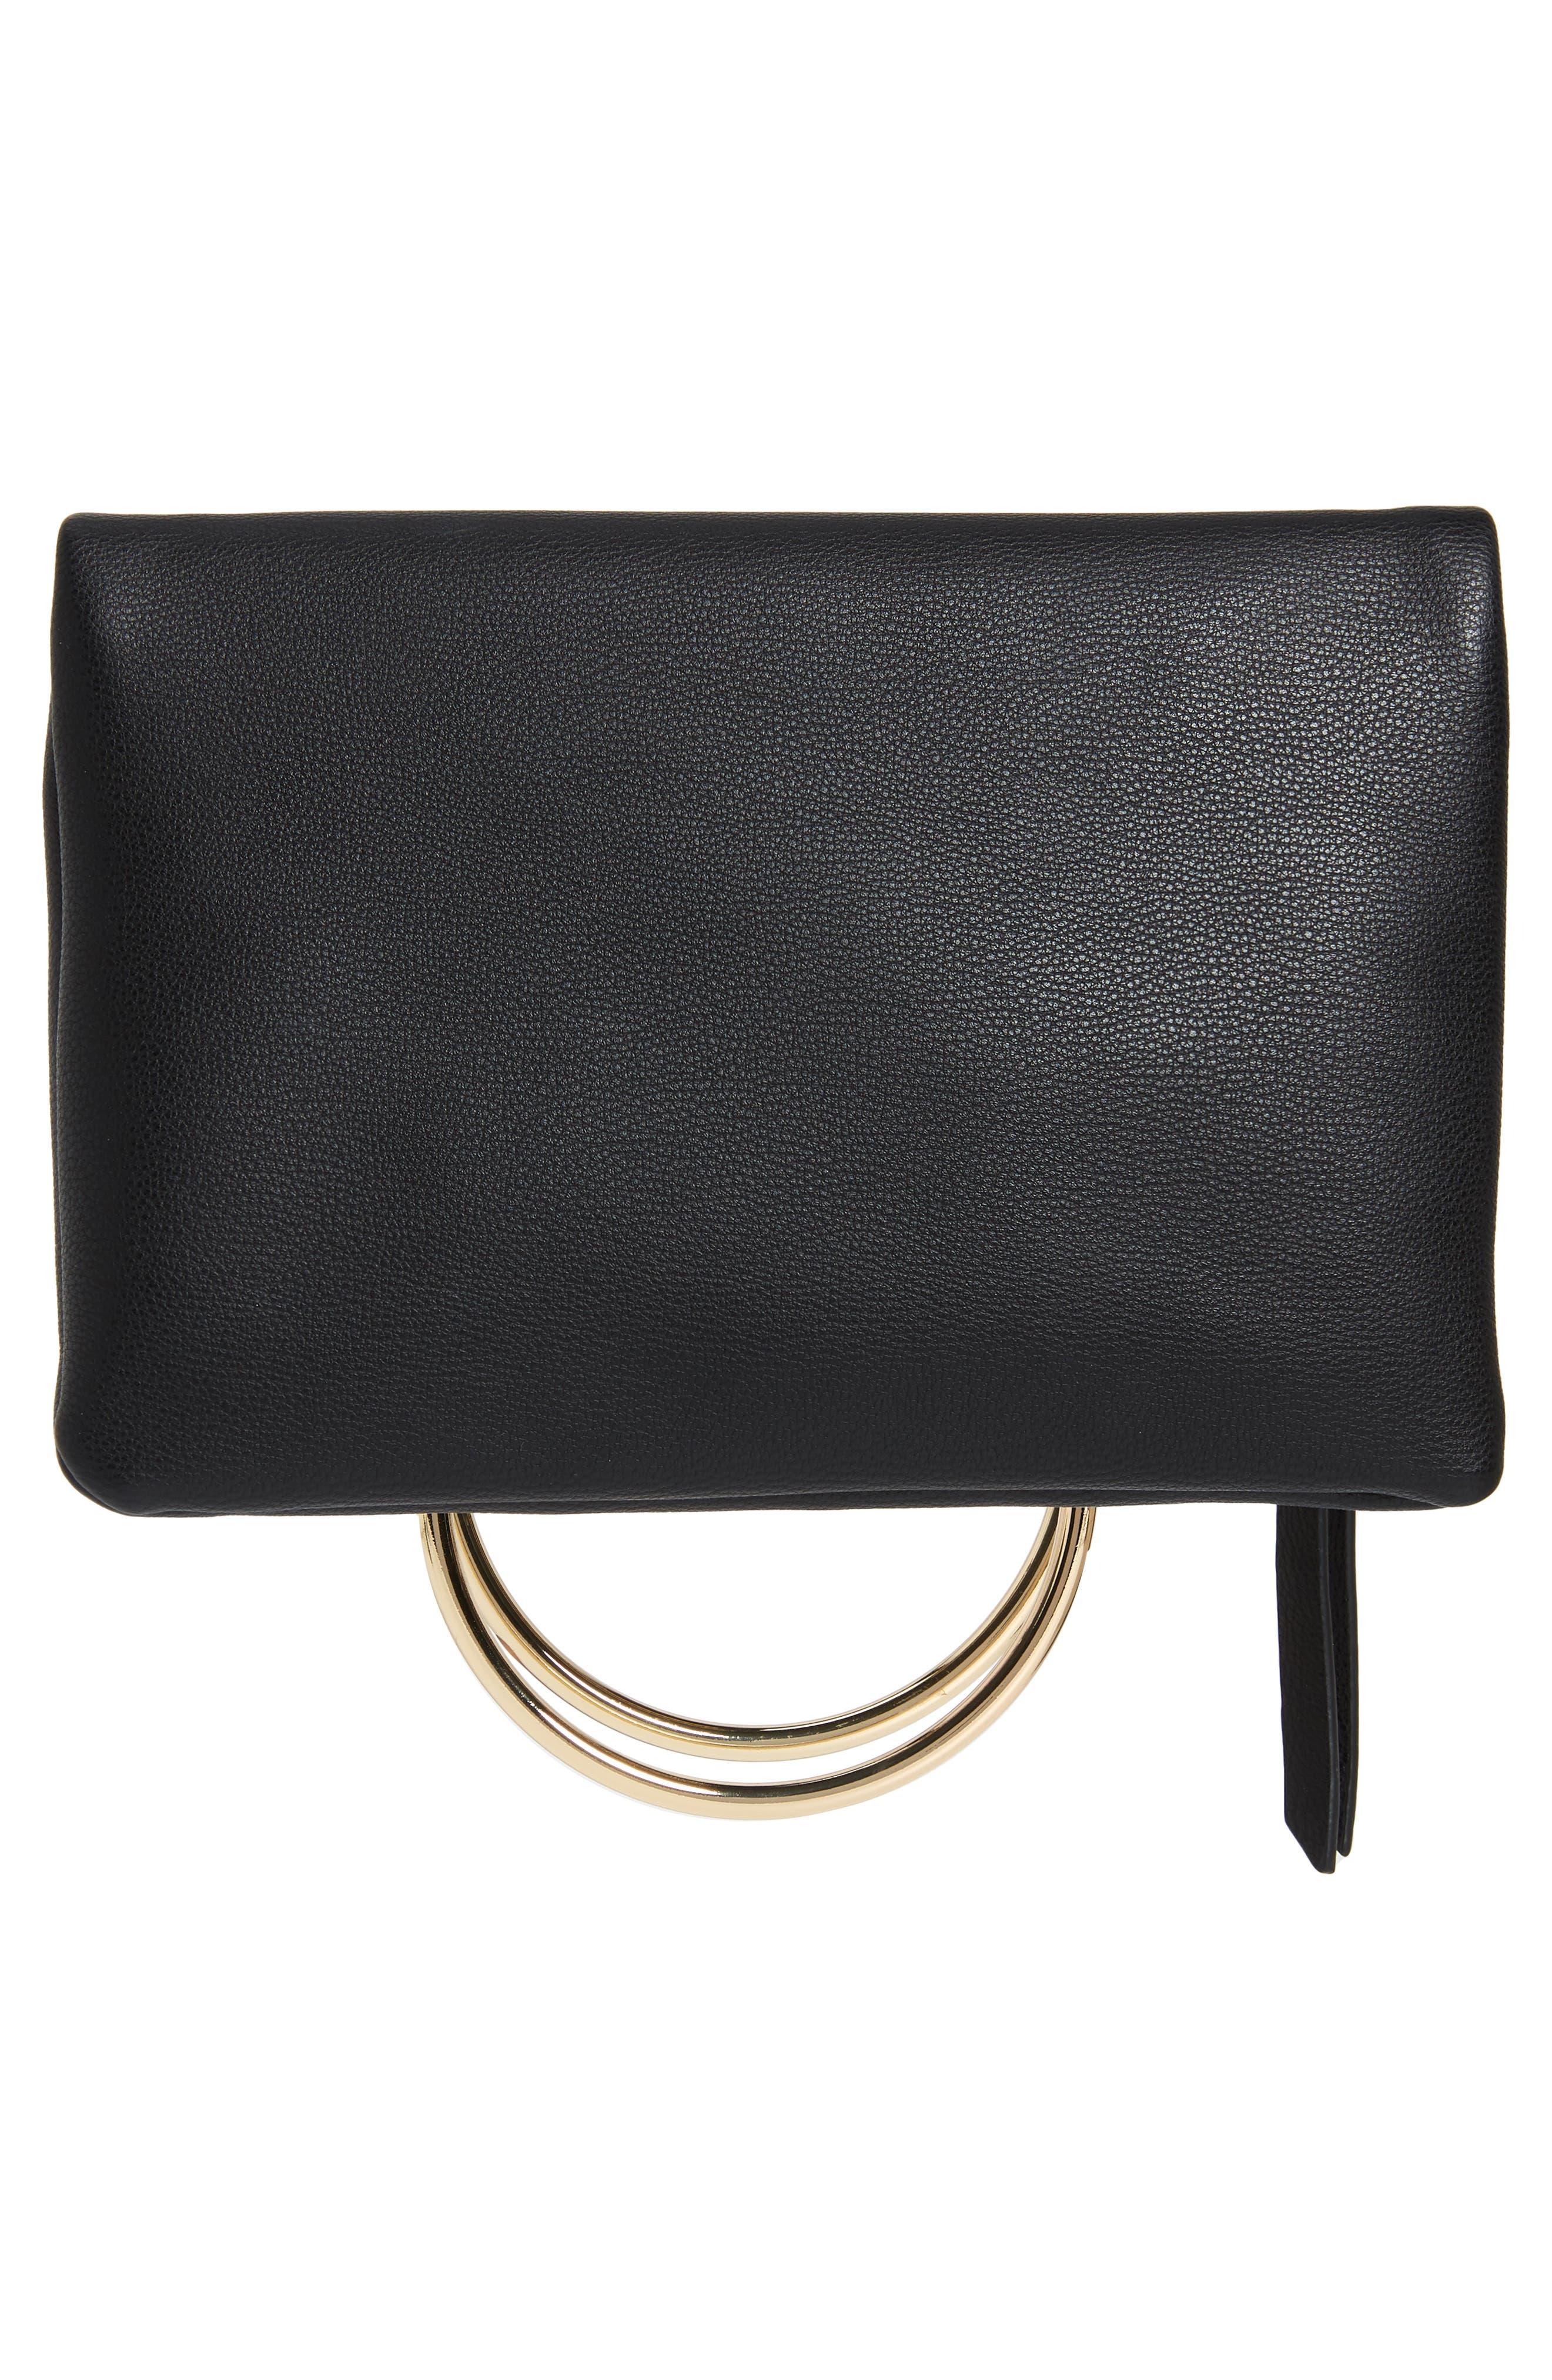 Skyler Faux Leather Foldover Clutch,                             Alternate thumbnail 3, color,                             BLACK